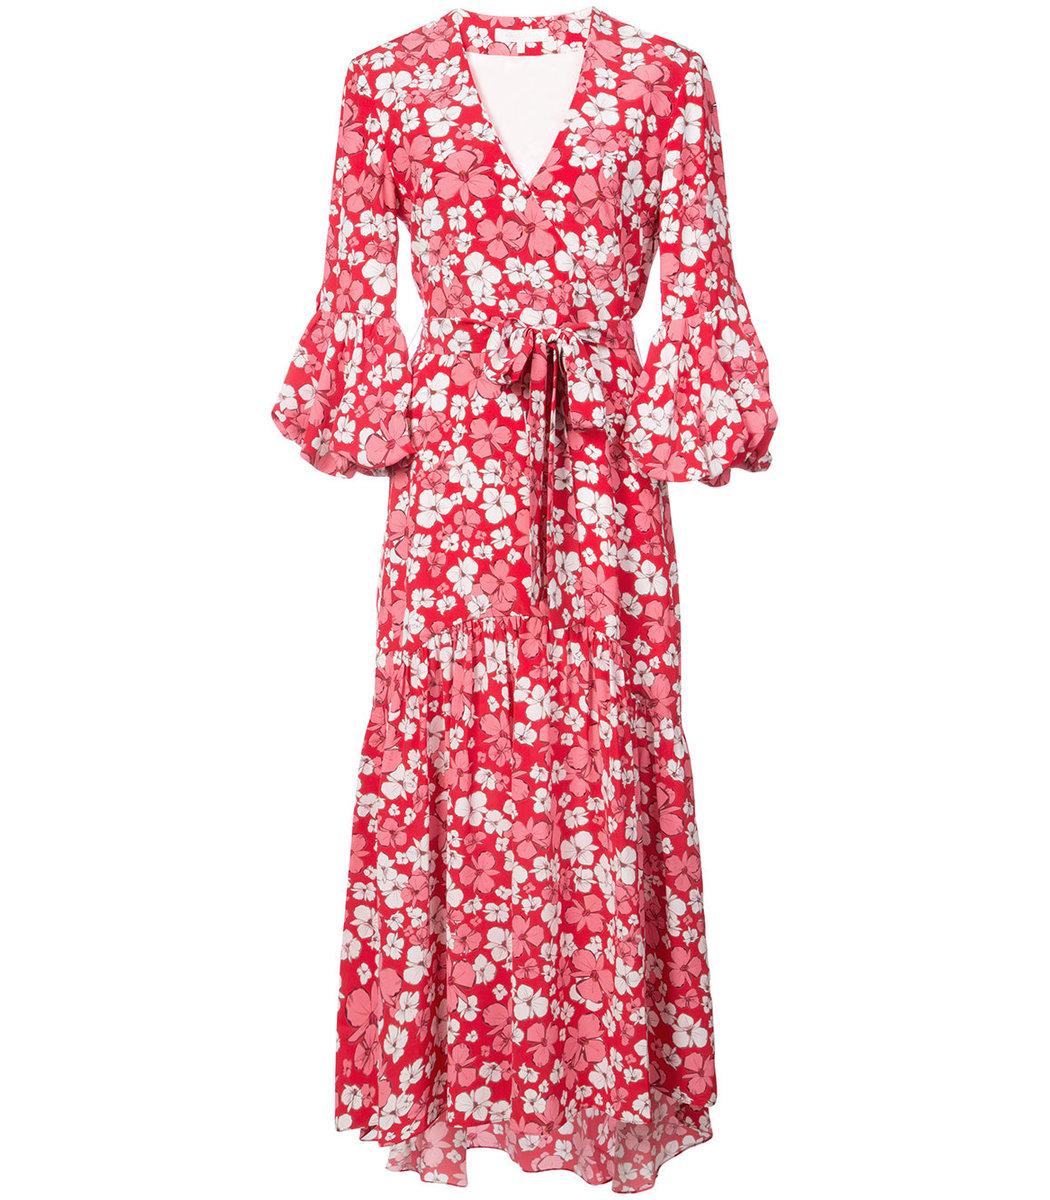 Borgo De Nor Ingrid Red and White Floral Print Dress